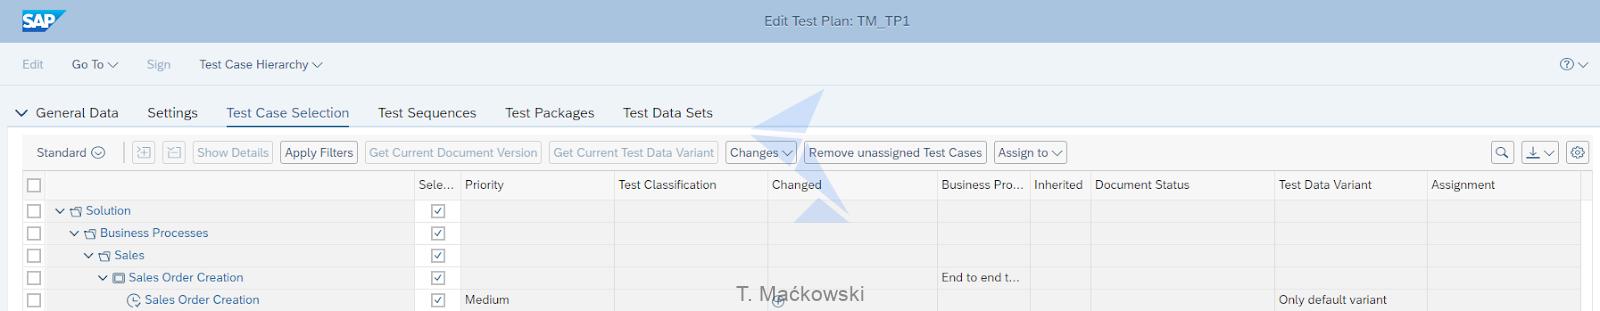 Edit_test_plan